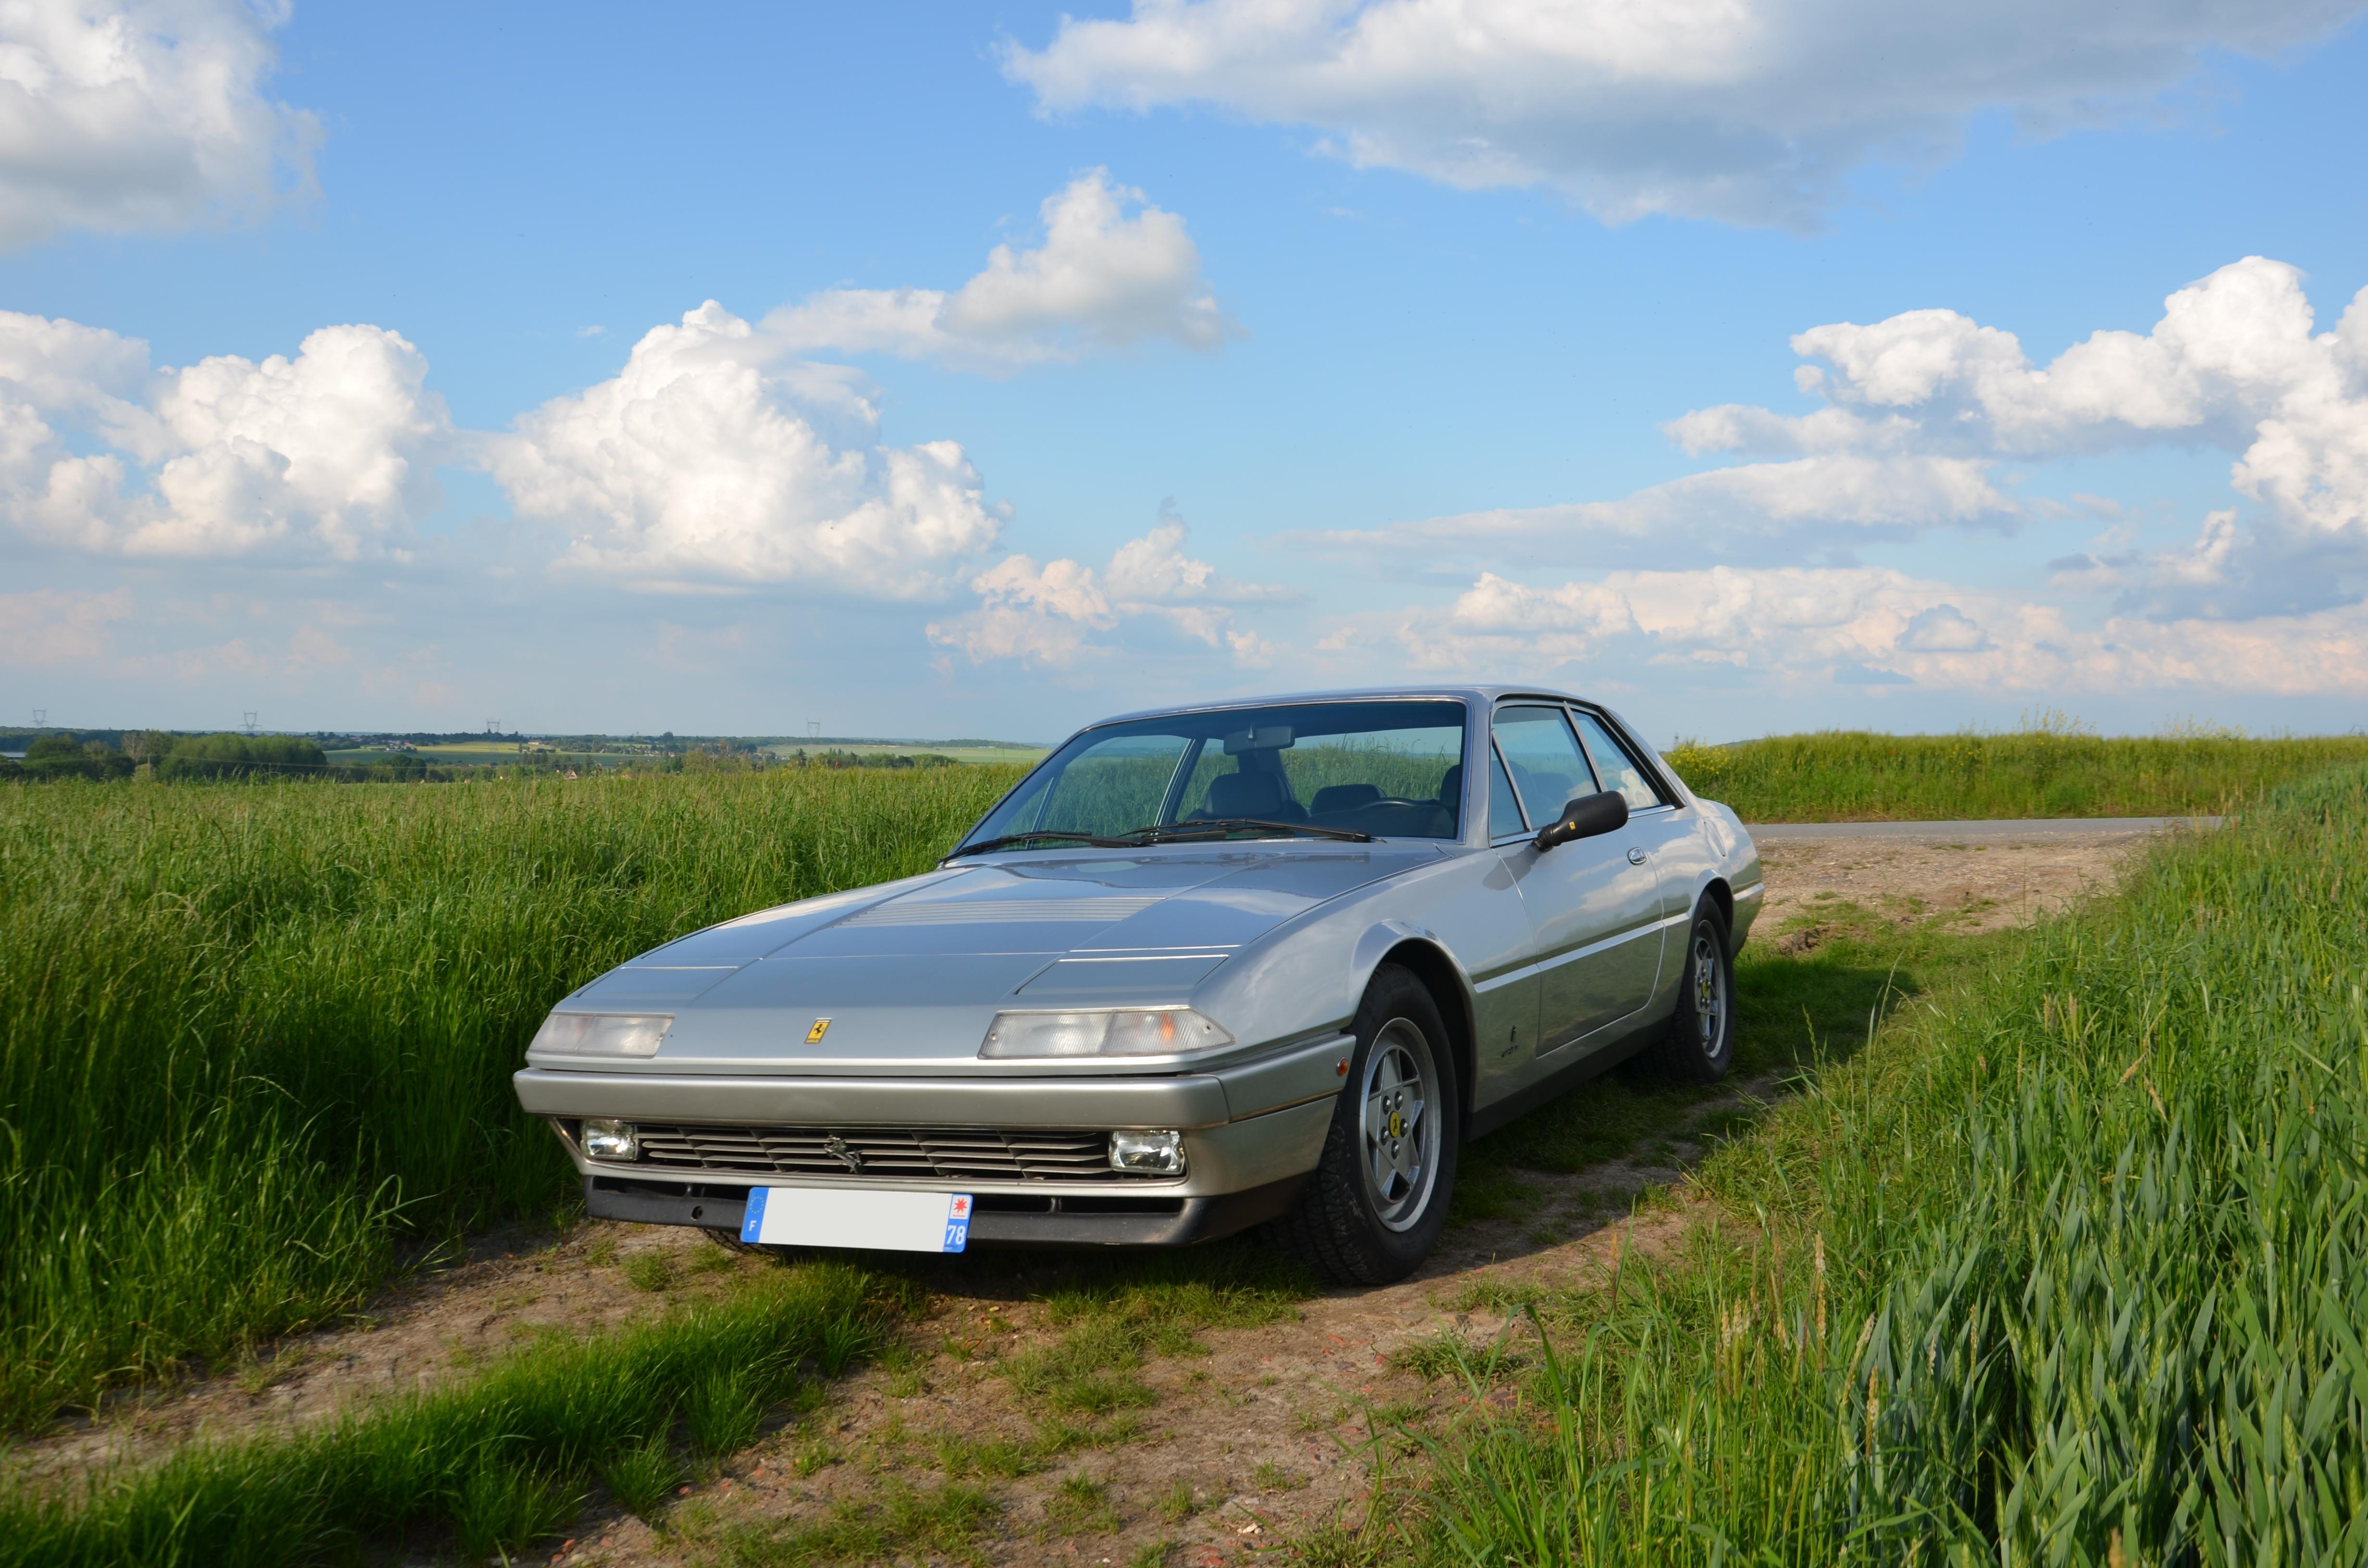 Artcurial motorcars le mans classic sale 2016 auction classic 1986 ferrari 400 412 vanachro Images